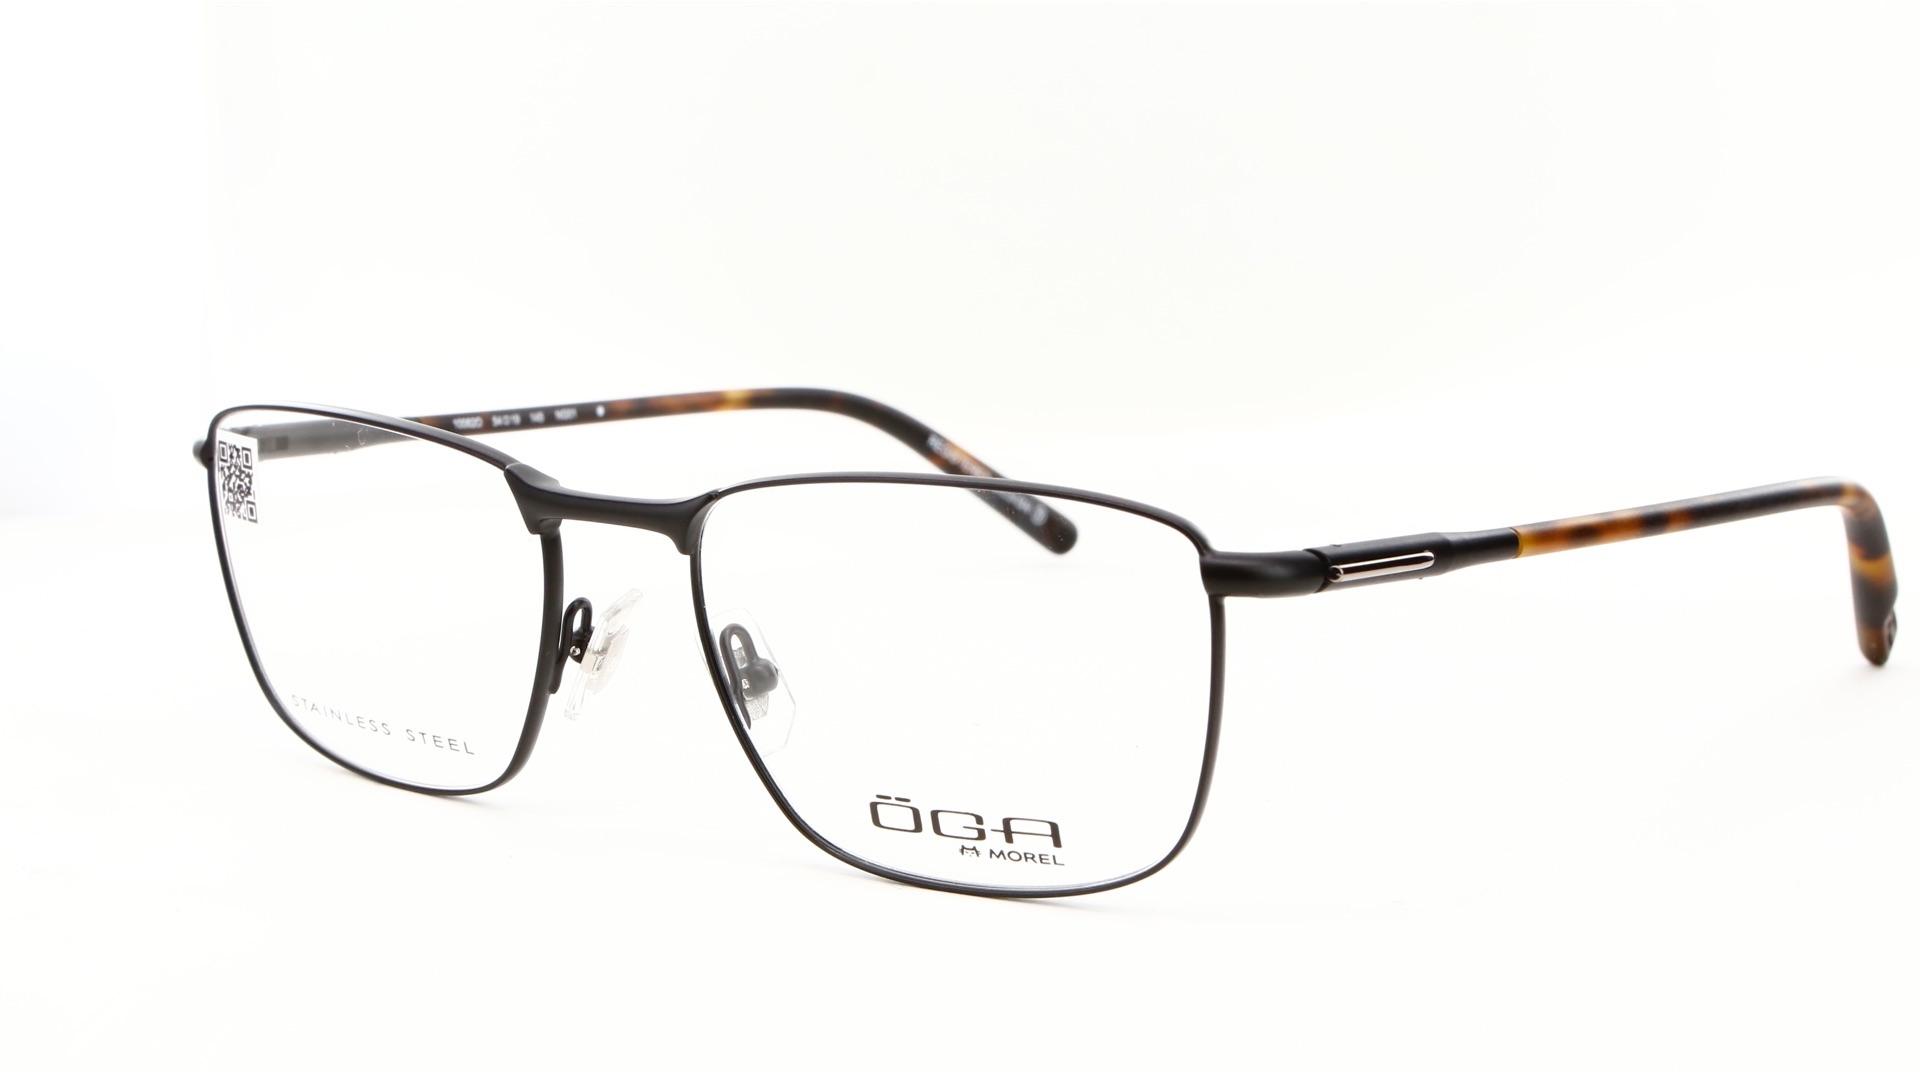 OGA - ref: 80589